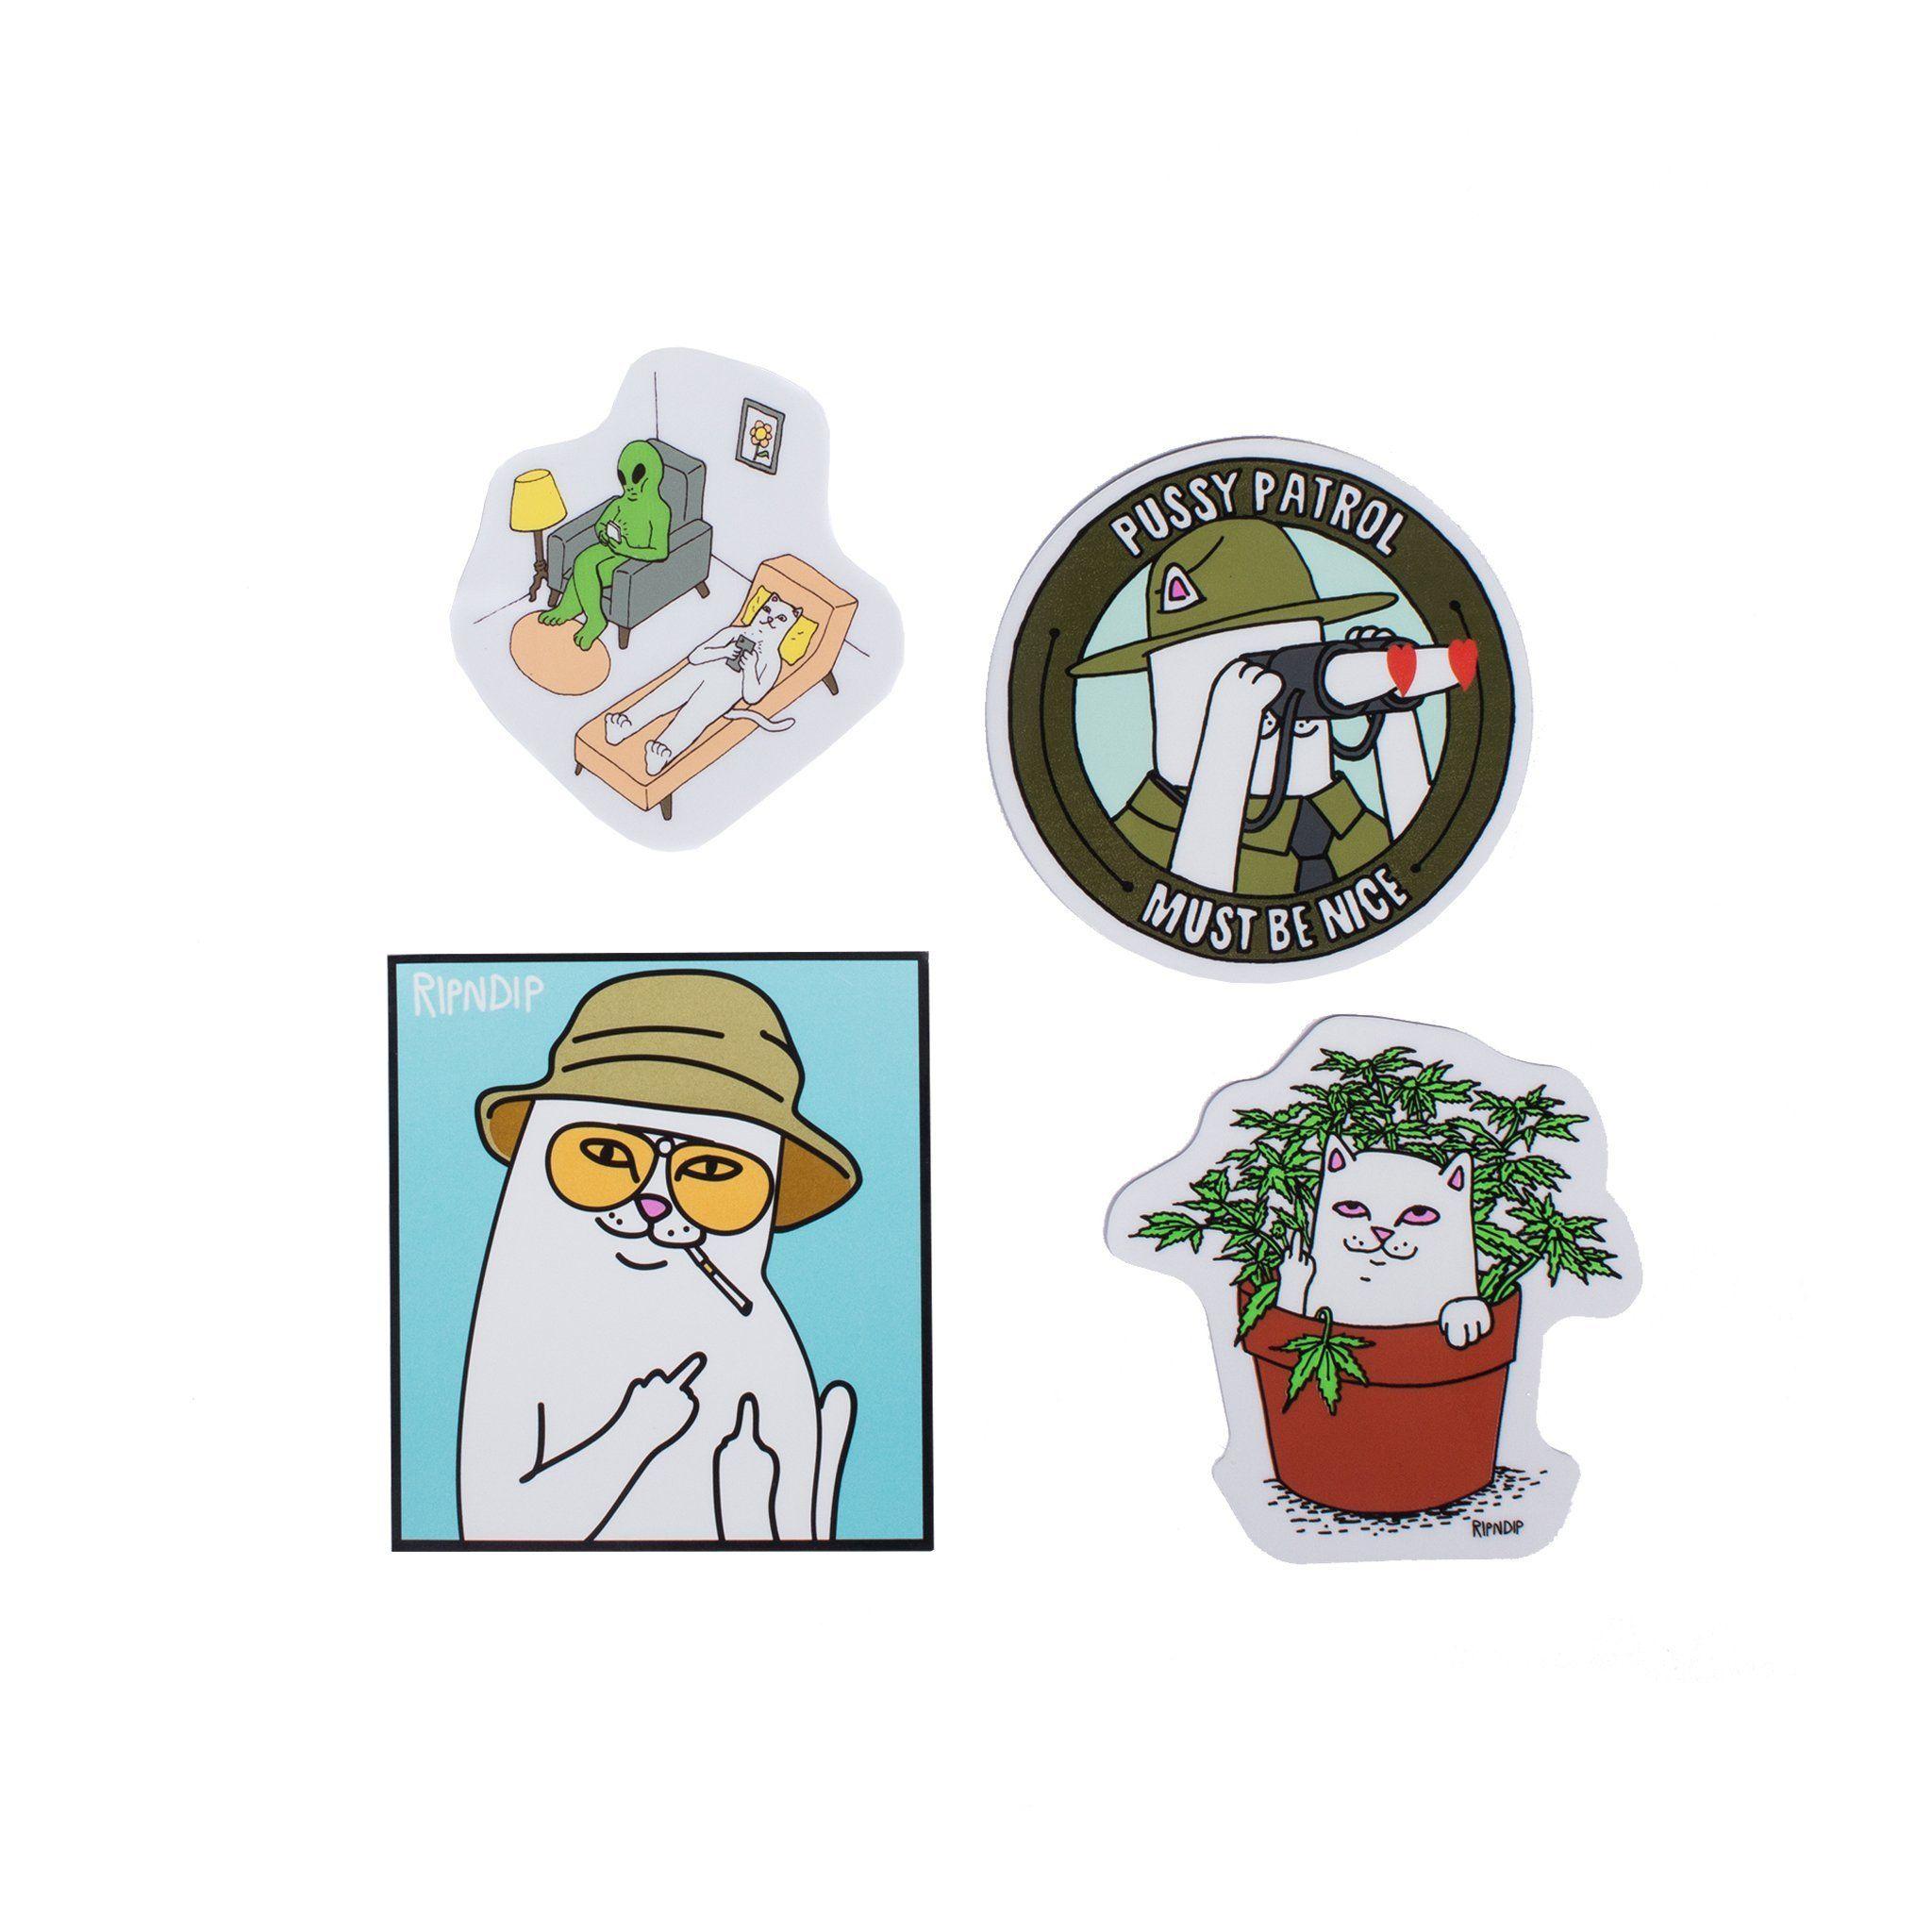 Ripndip Fall 2017 Sticker Pack In 2020 Stickers Stickers